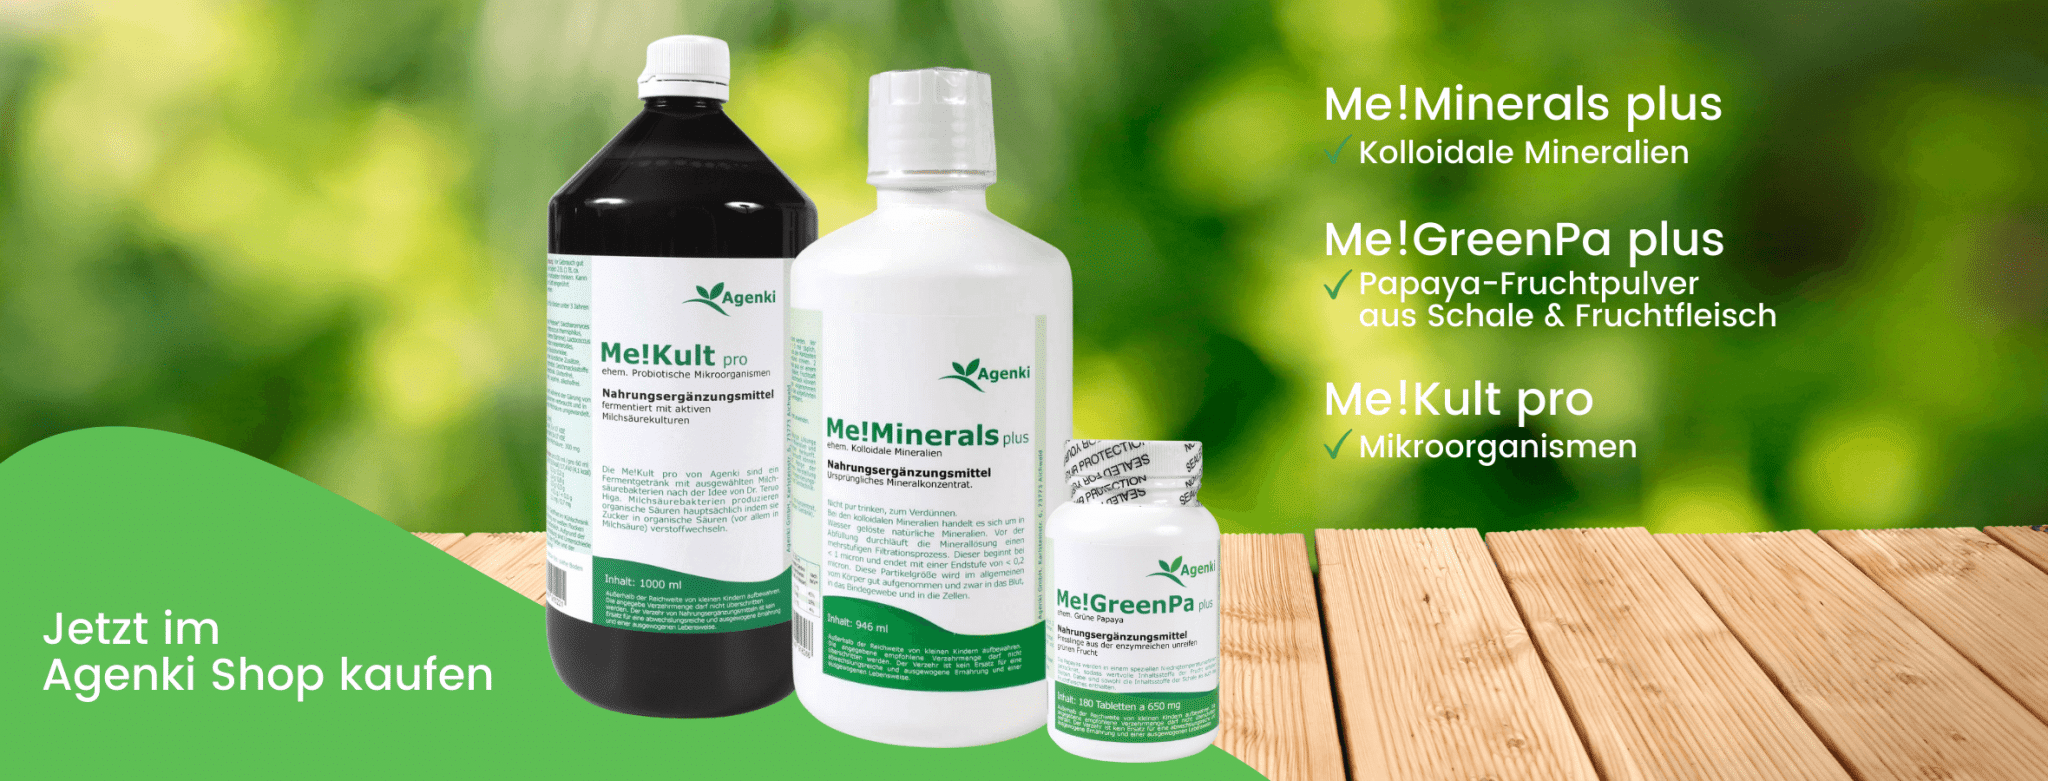 Me!Kult pro Mikroorganismen, Me!Minerals plus Kolloidale Mineralien & Me!Green Pa plus Grüne Papaya - Agenki